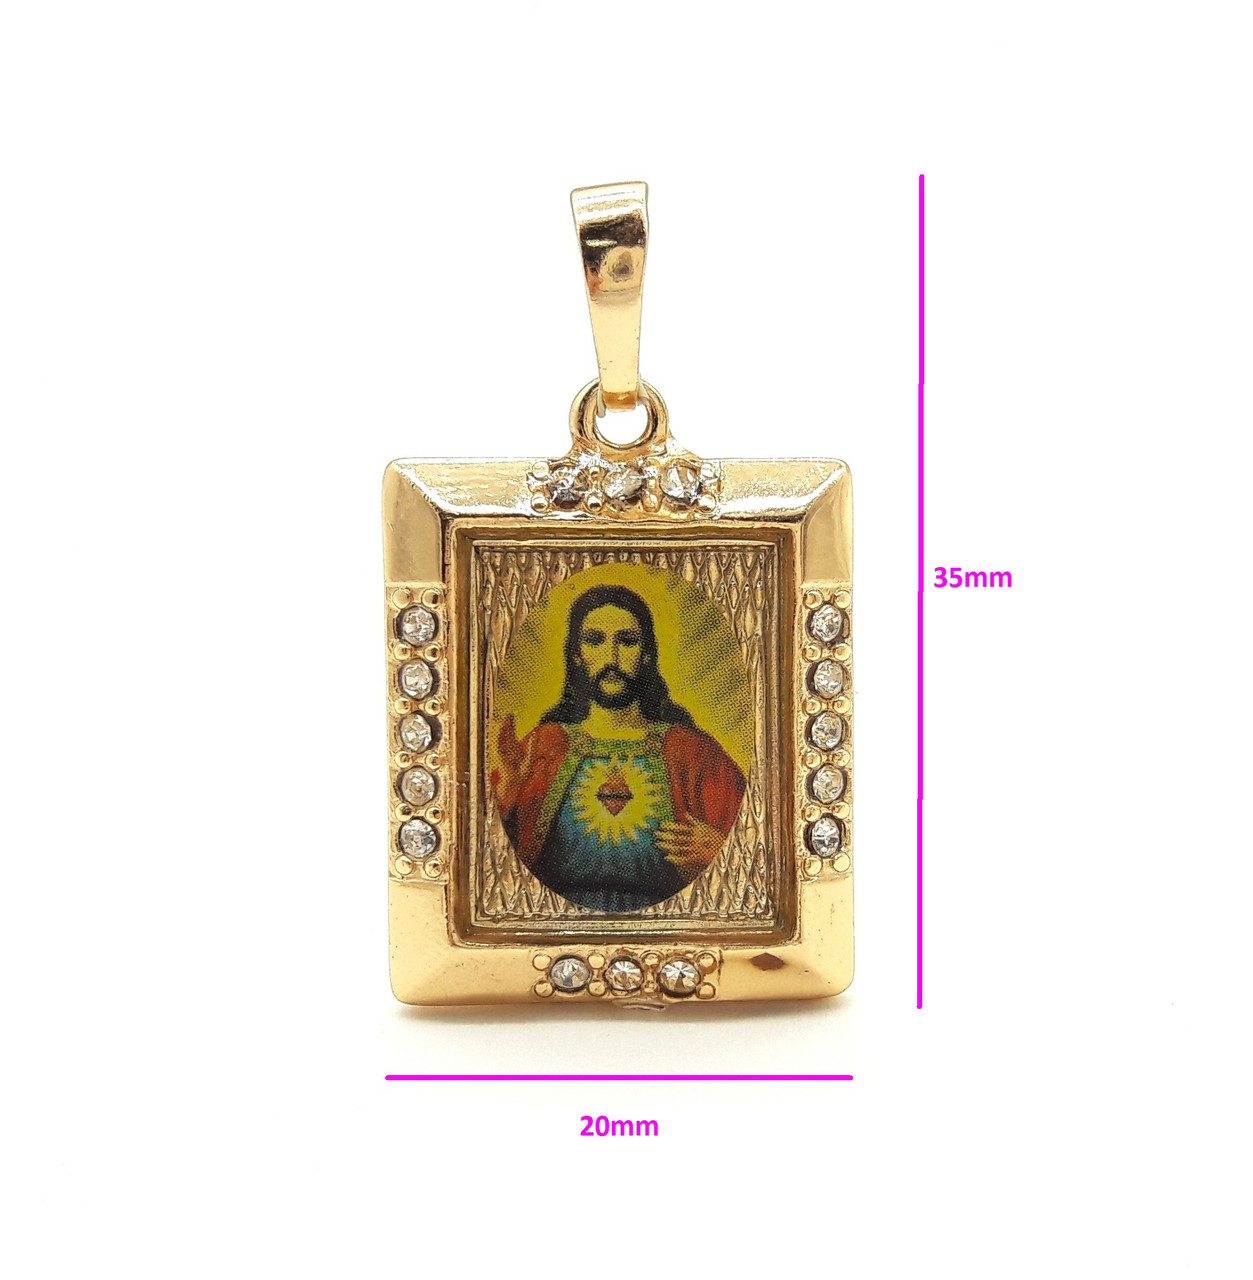 Ладанка квадратная, Христос с цирконием, позолота